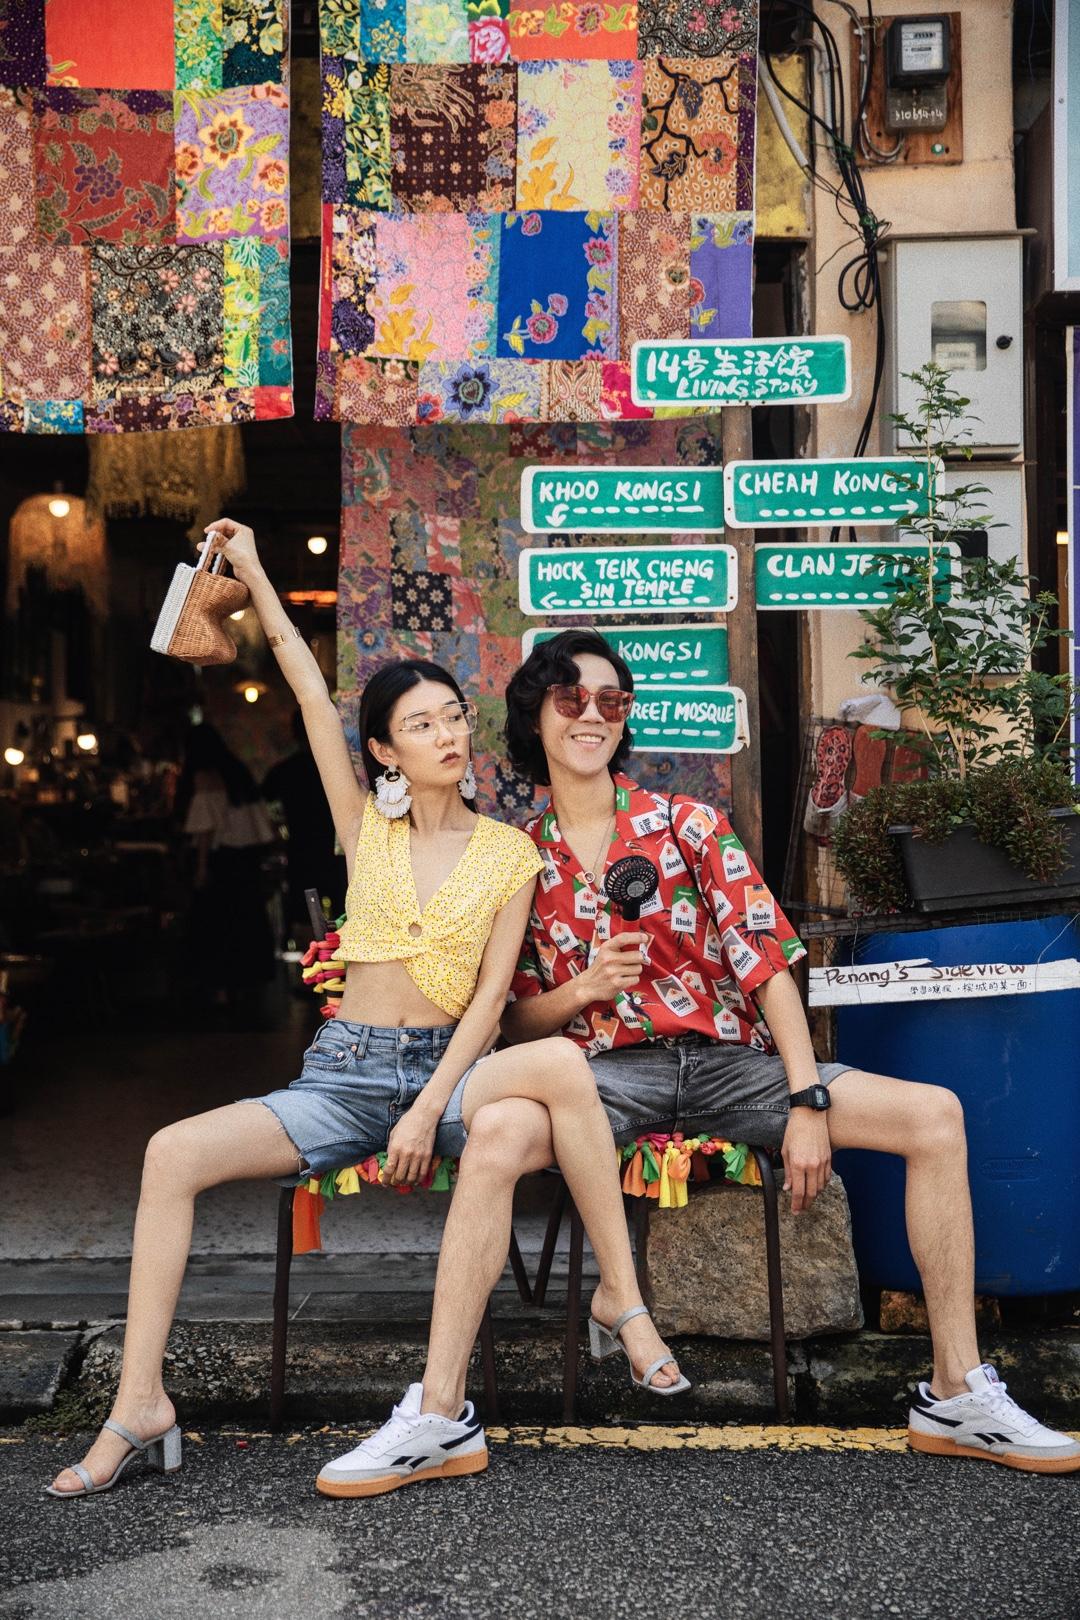 #Ava搭配日记#槟城乔治市壁画街~这条街的艺术涂鸦就好像是乔治市的名片,经过日晒雨淋的壁画虽然有些早已斑驳,不过别有一番风情,让人更加留恋。 上衣&热裤:Free People鞋子:by far包:LUCY FOLK 眼镜:FIXXATIVE摄影:摄影人春海博主微博/微信公众号/Instagram:AvaFoo